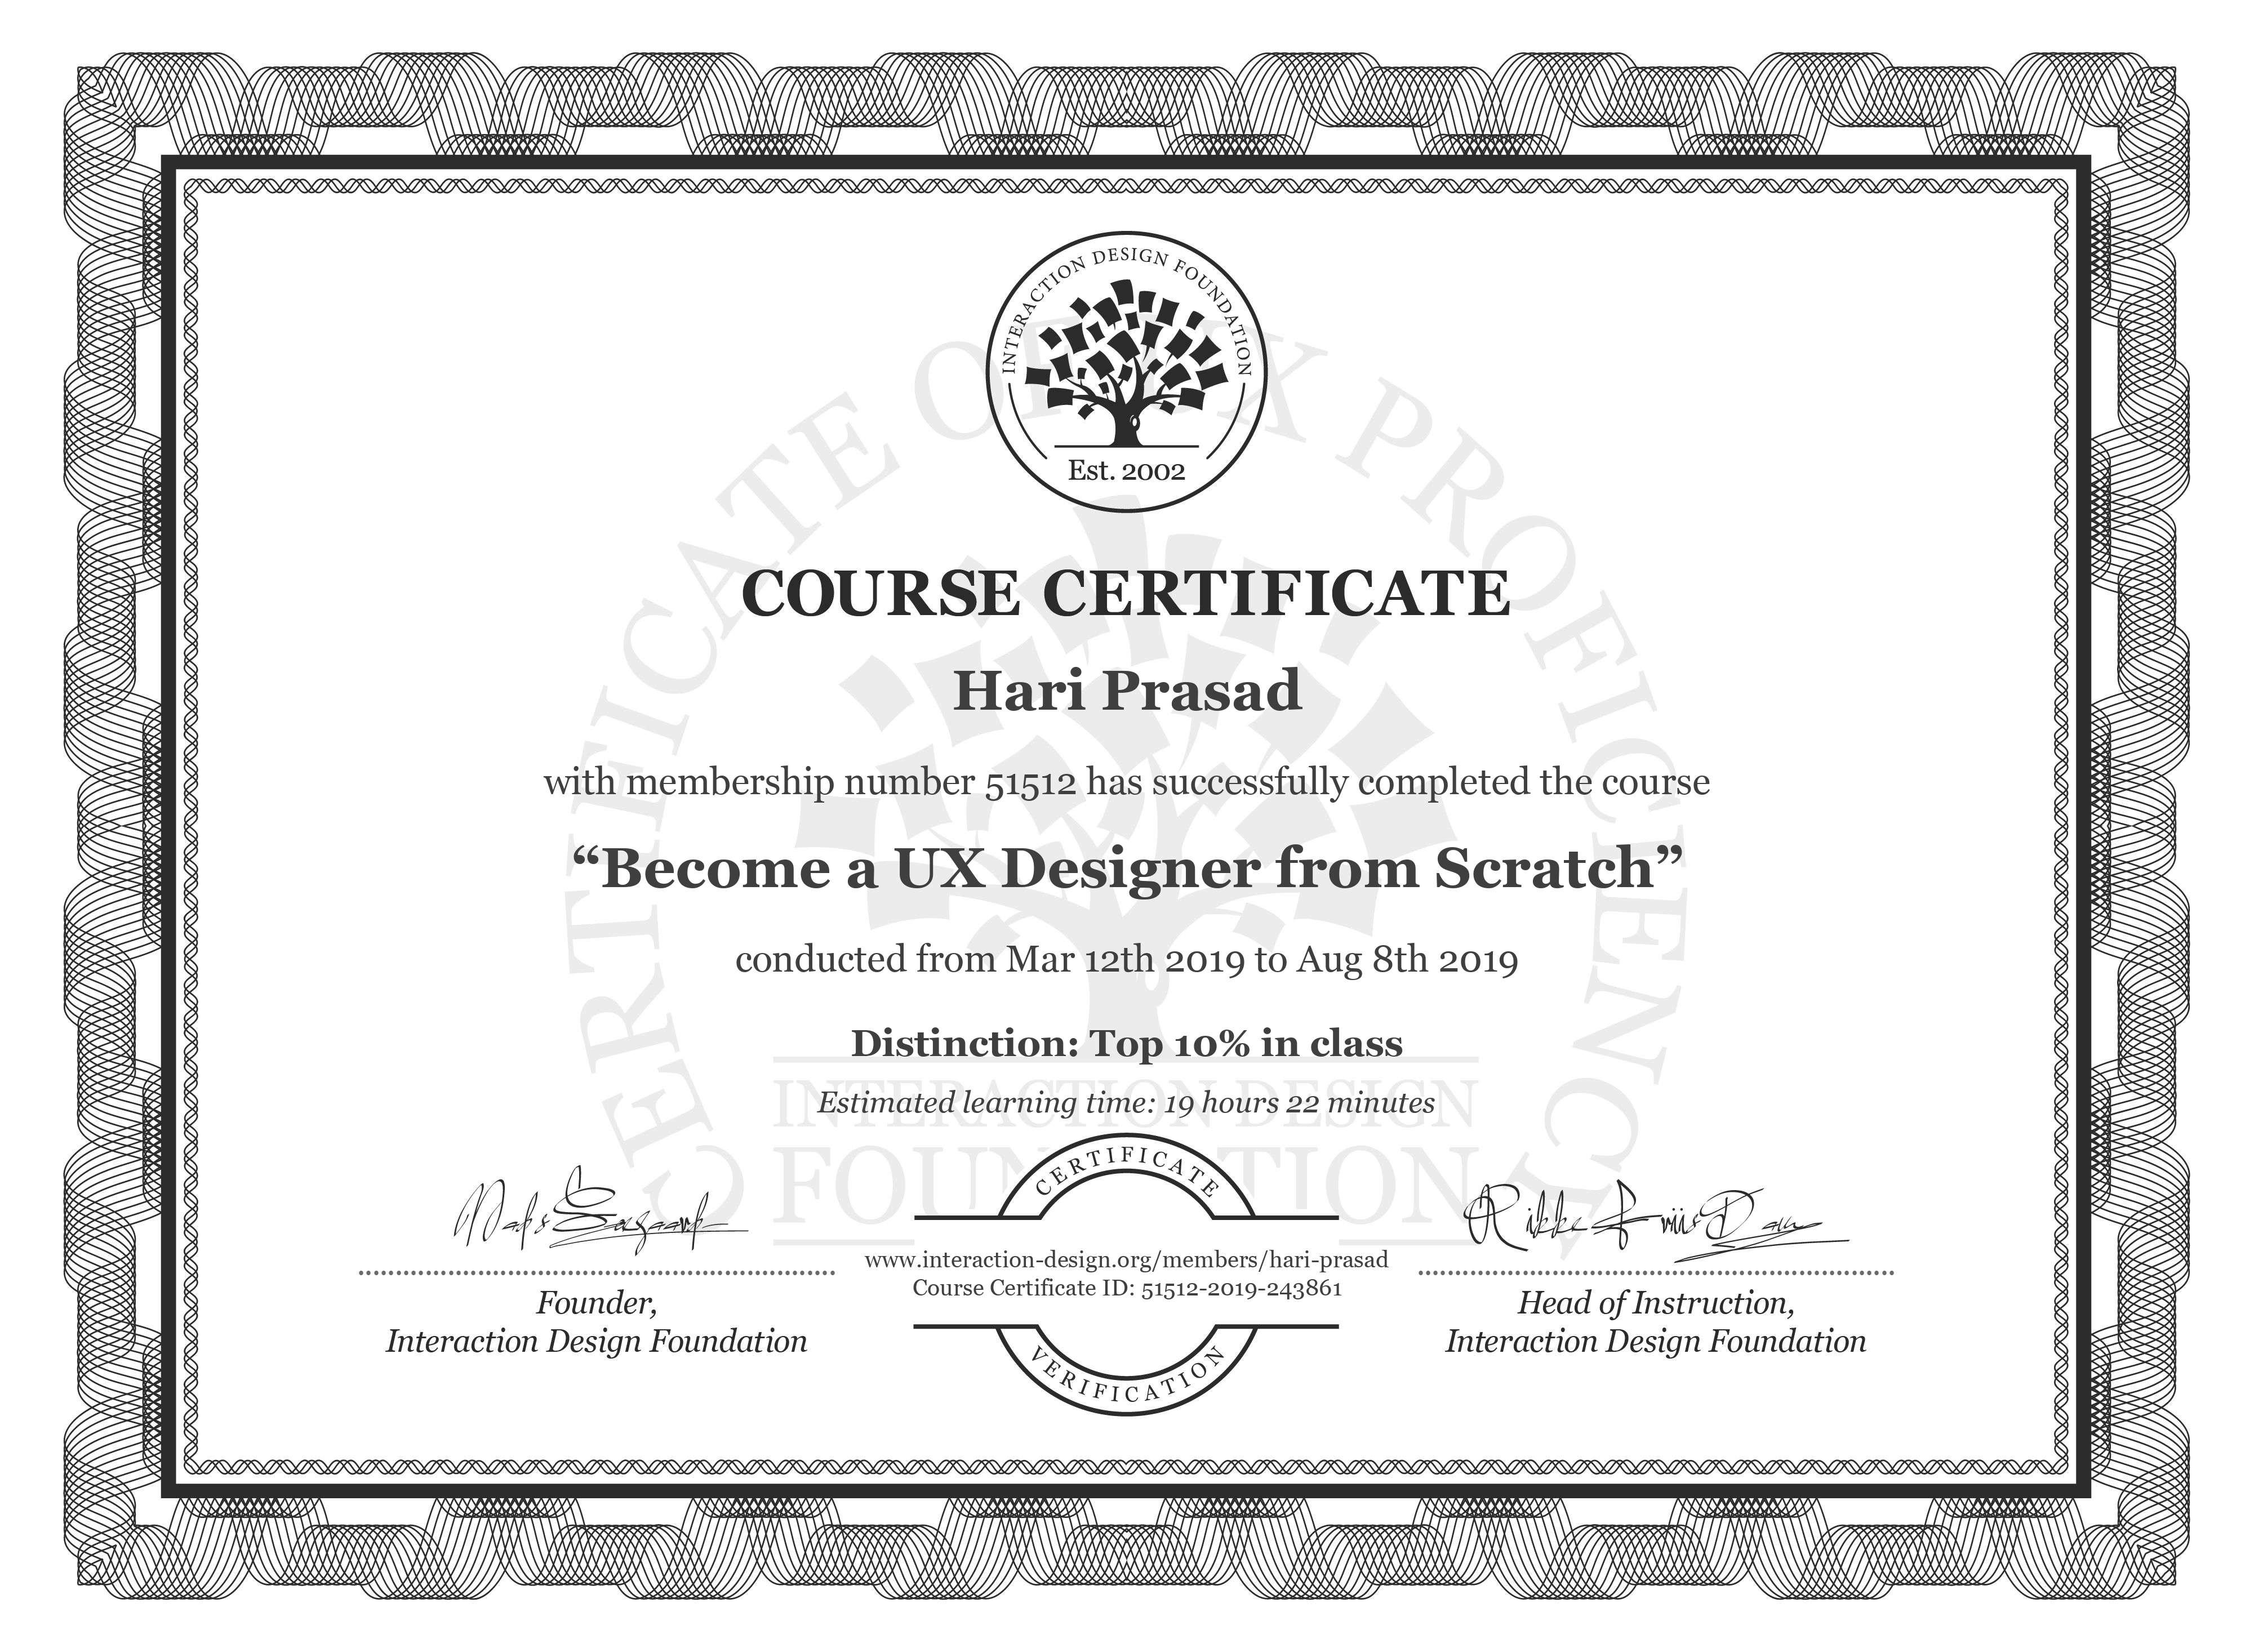 Hari Prasad's Course Certificate: User Experience: The Beginner's Guide